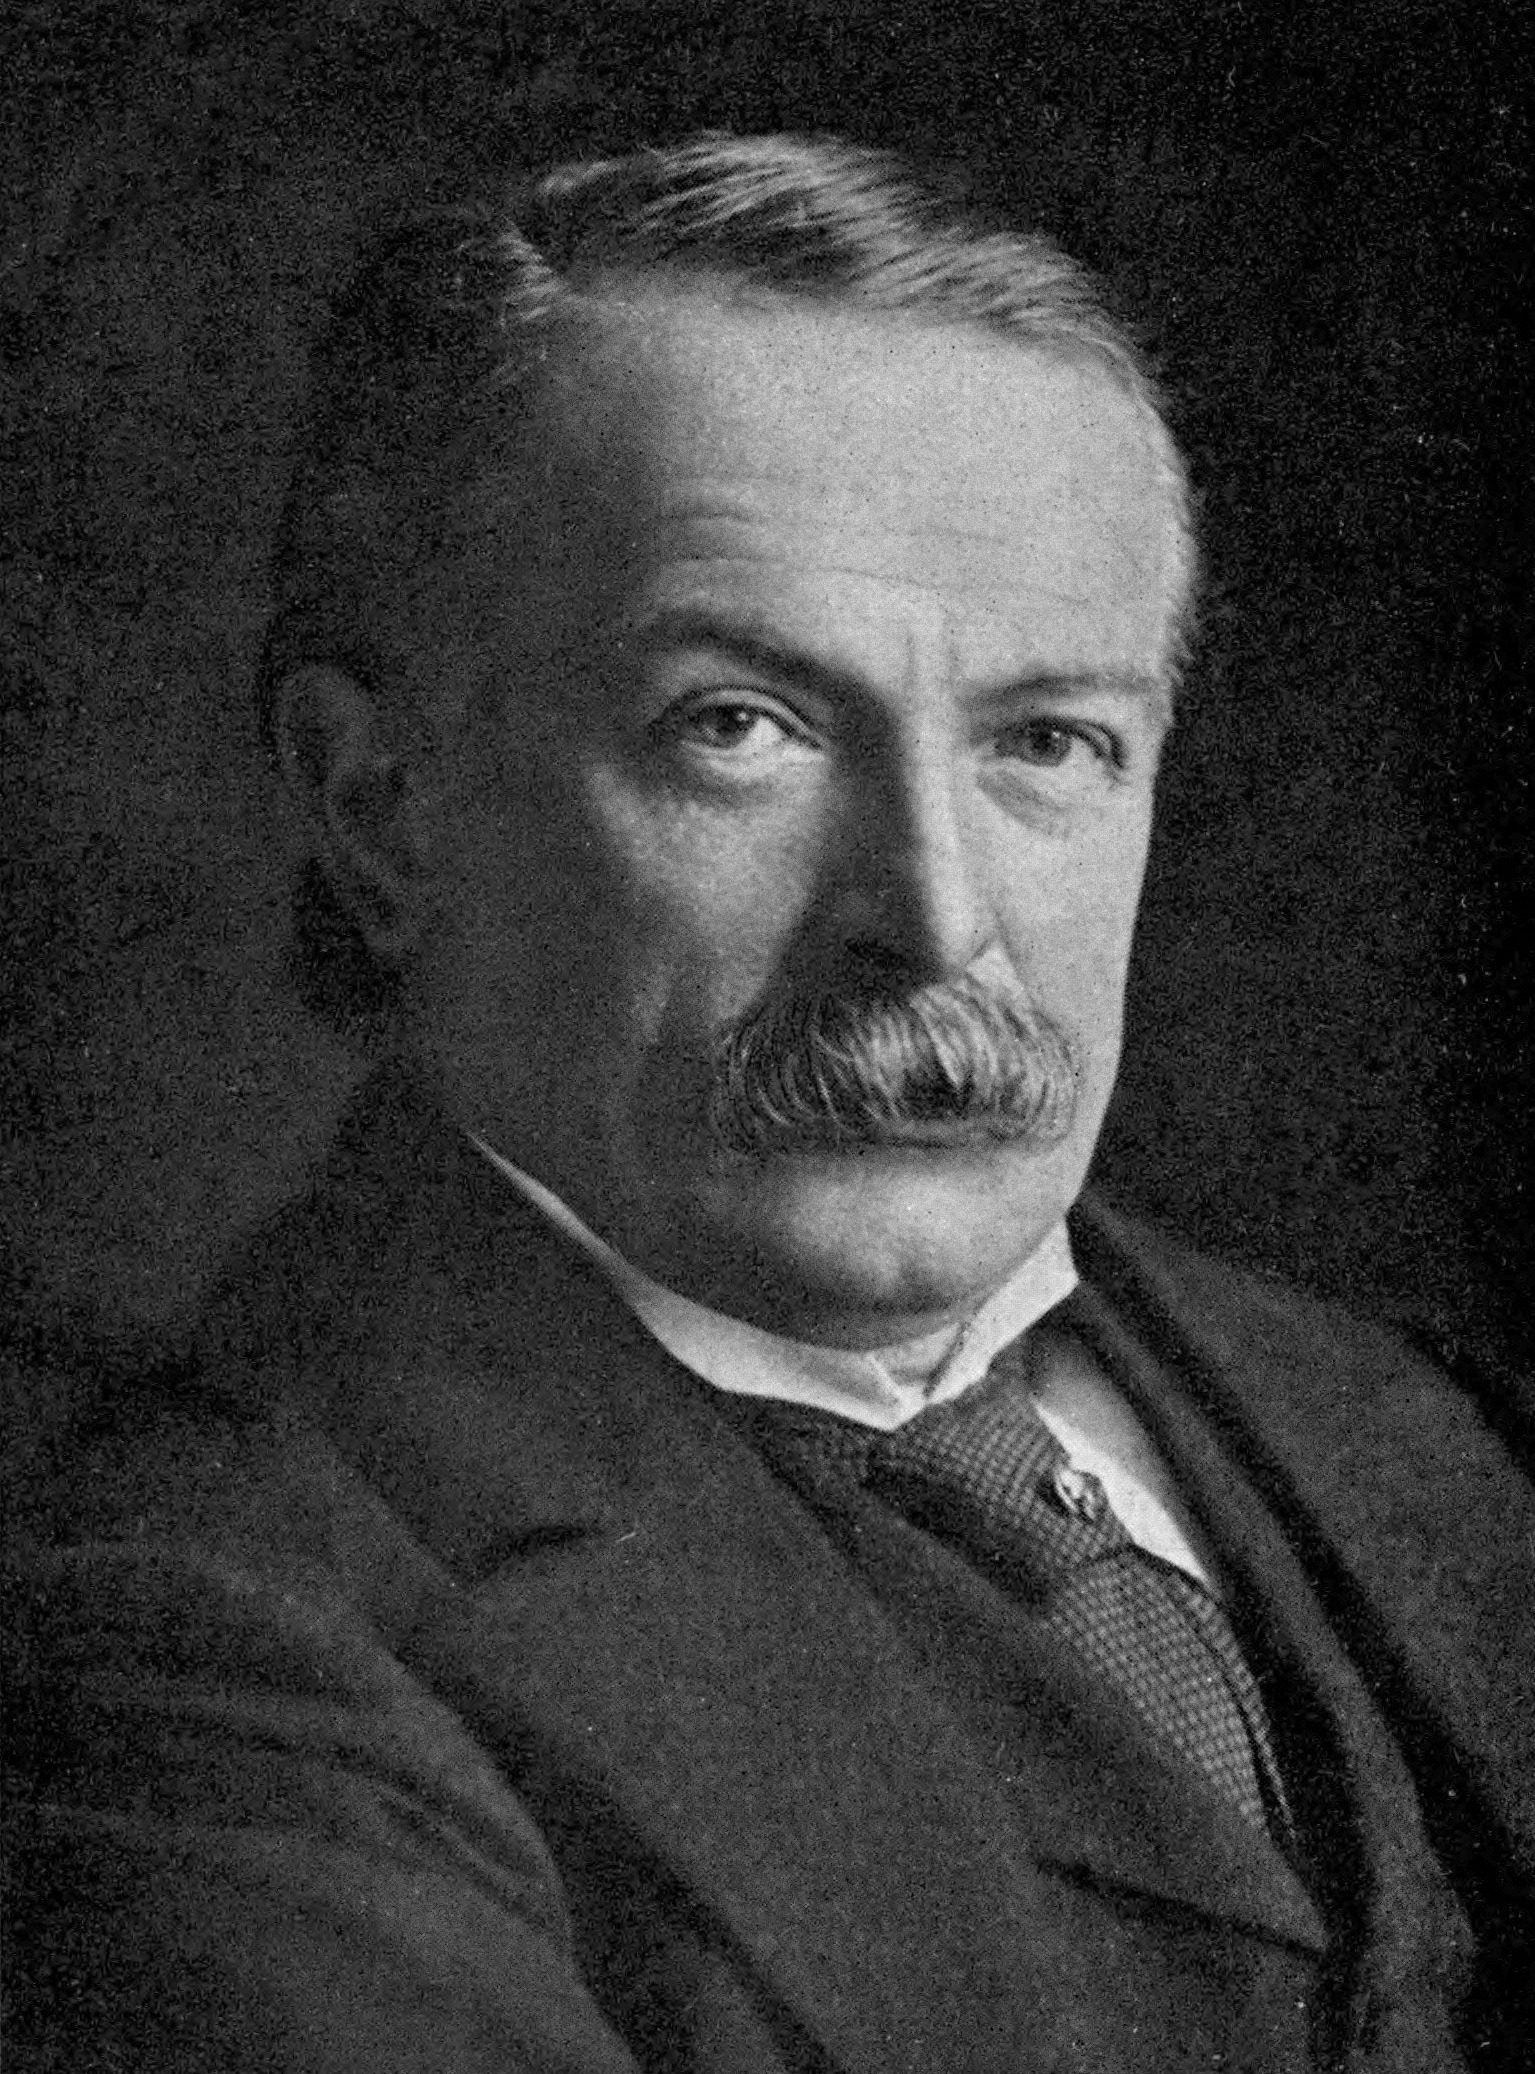 File:The Right Hon. David Lloyd George.jpg - Wikimedia Commons